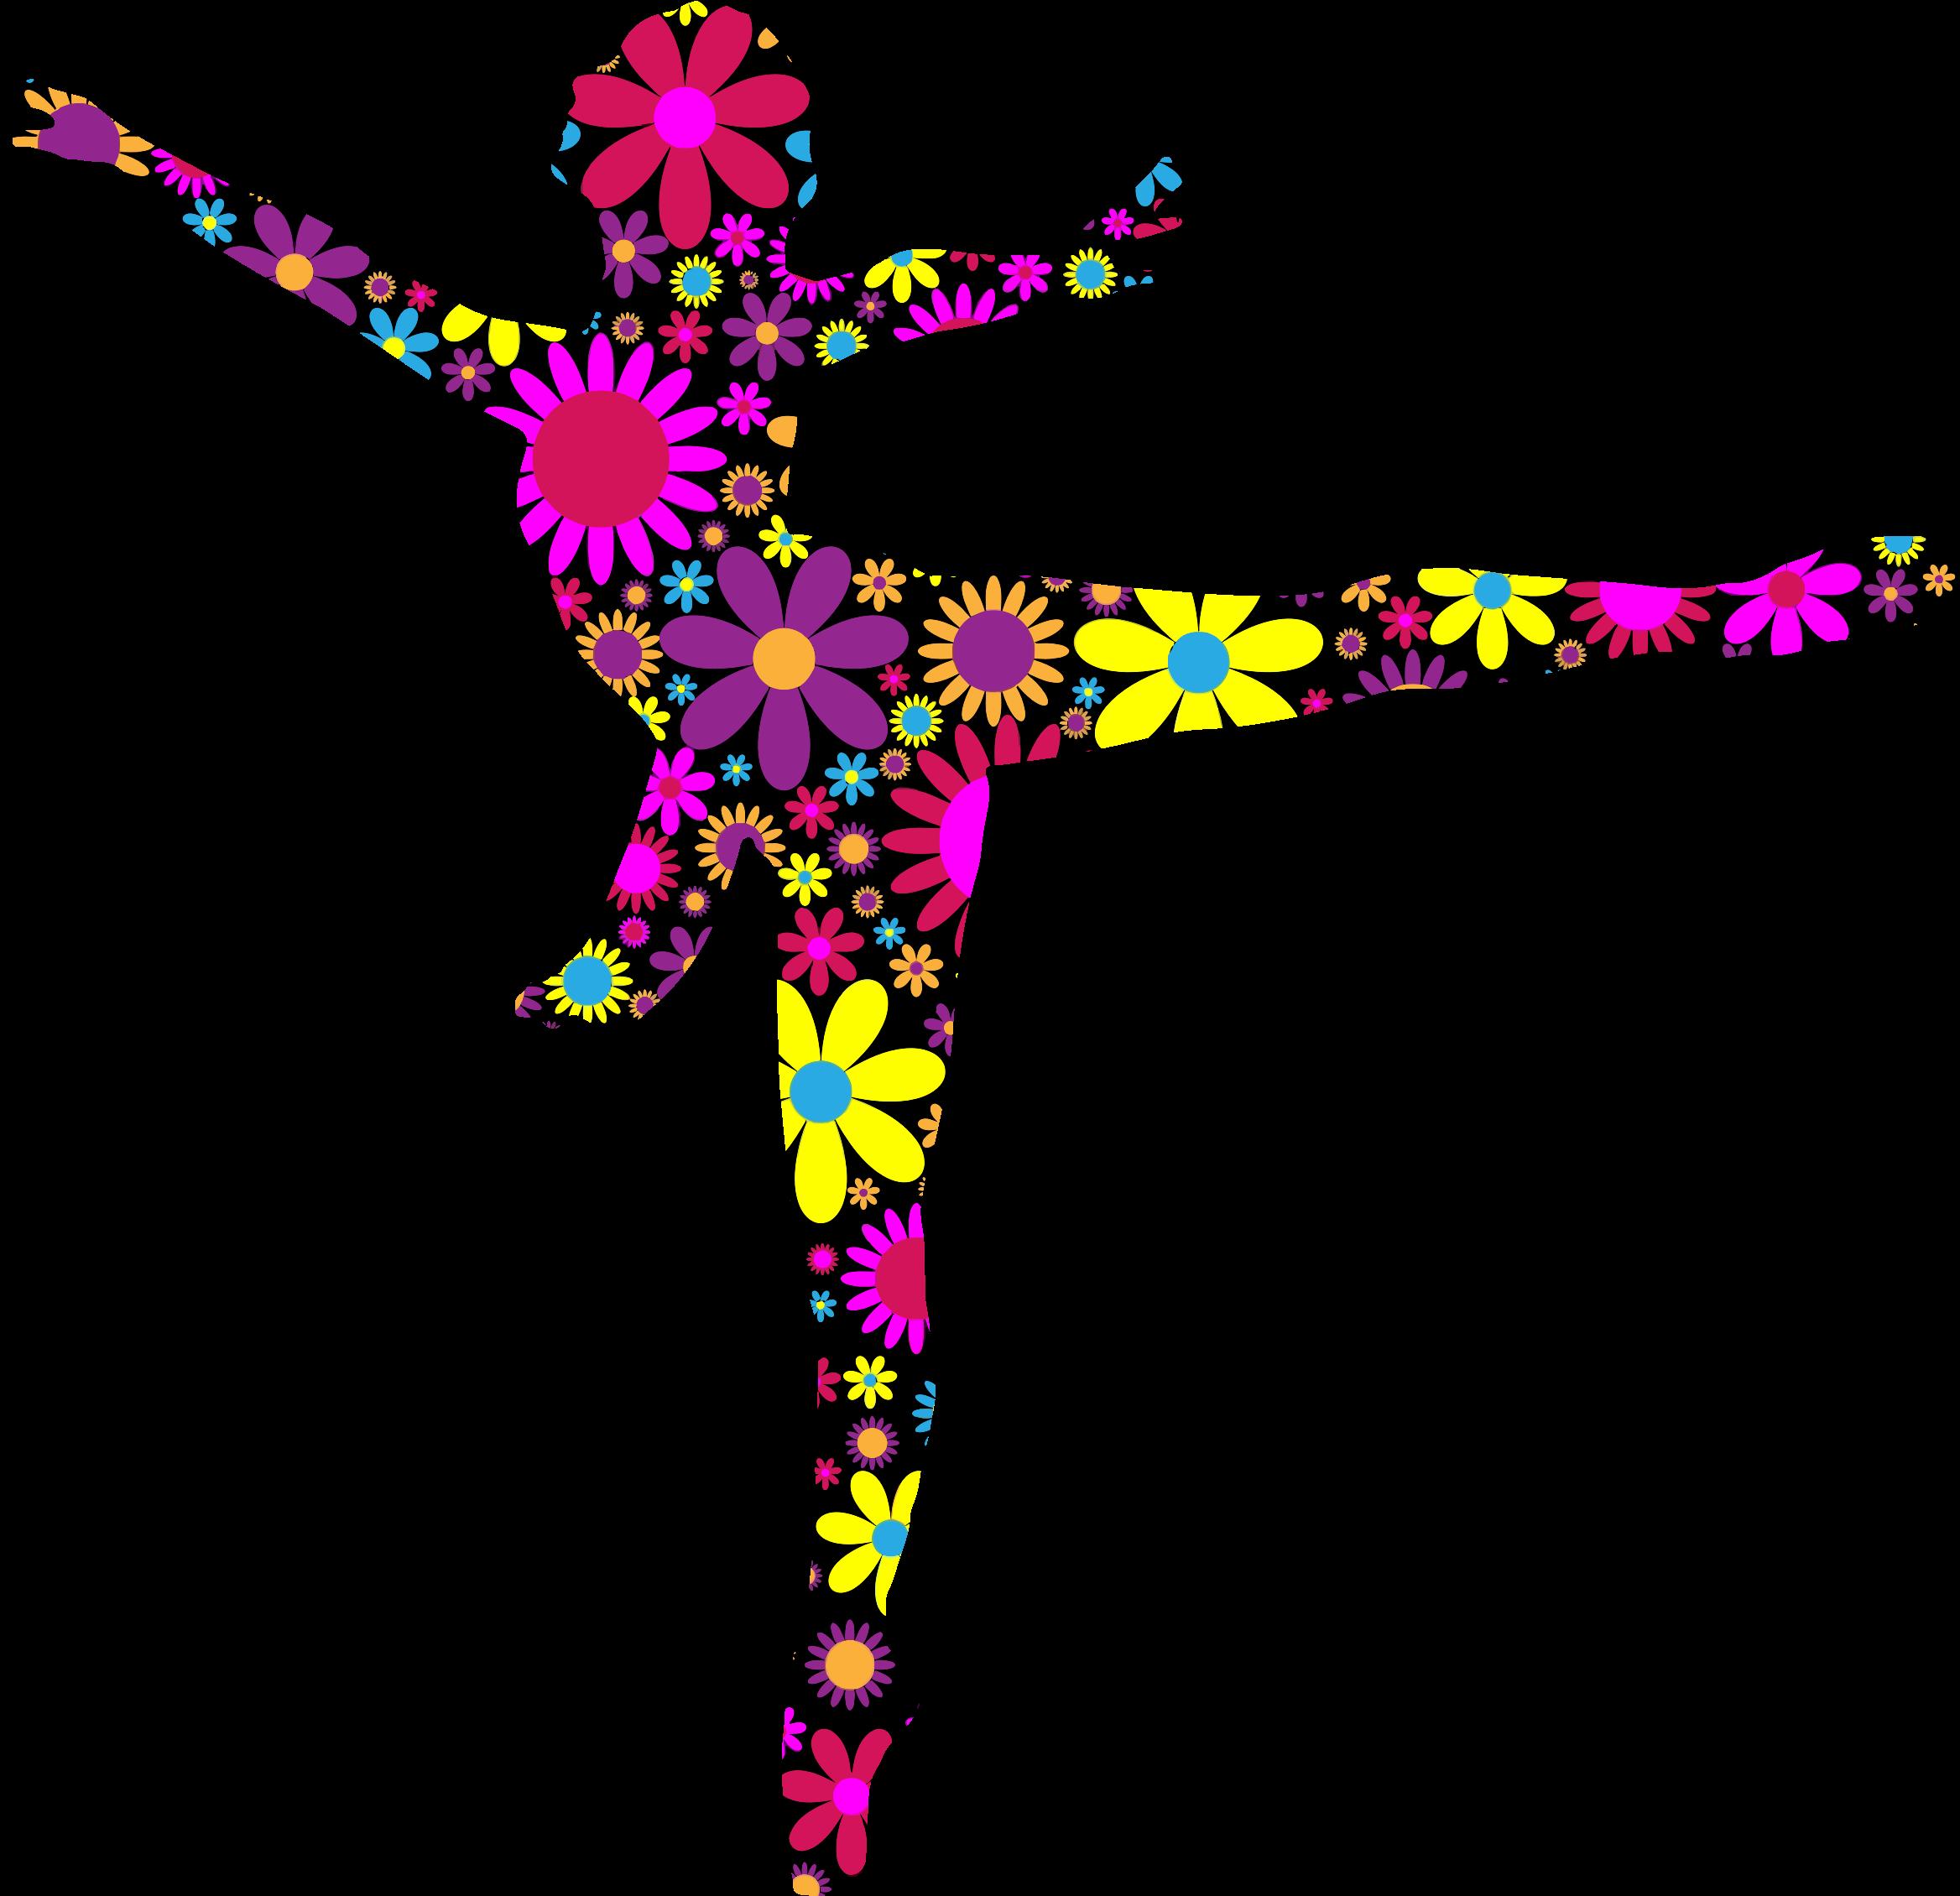 Floral Ballet Dancer Silhouette by @GDJ, Floral Ballet Dancer Silhouette, on @openclipart